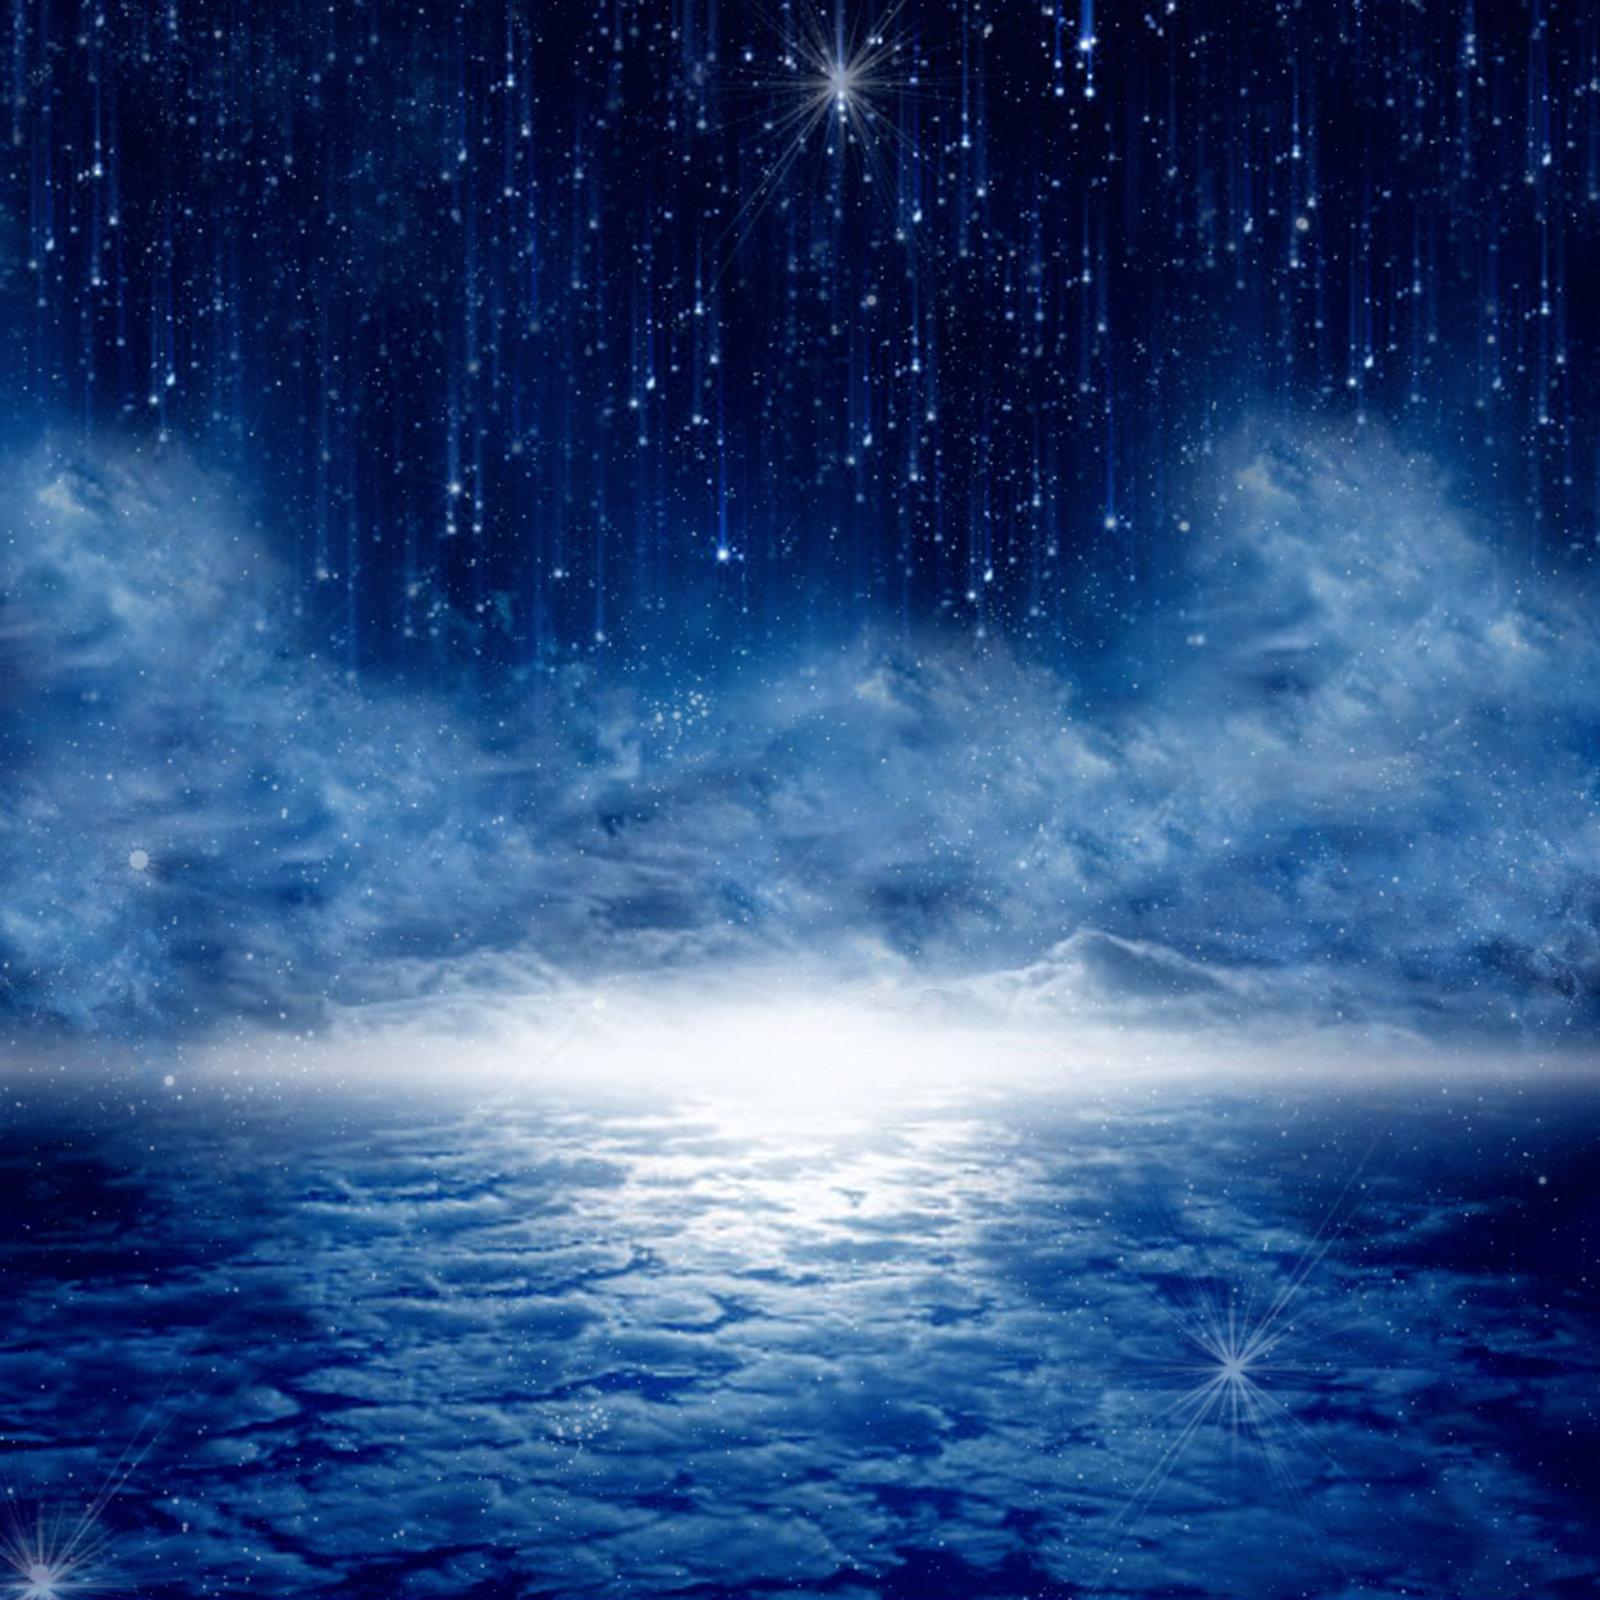 Premade Background    Starry Night Sky by KarahRobinson Art on 1600x1600